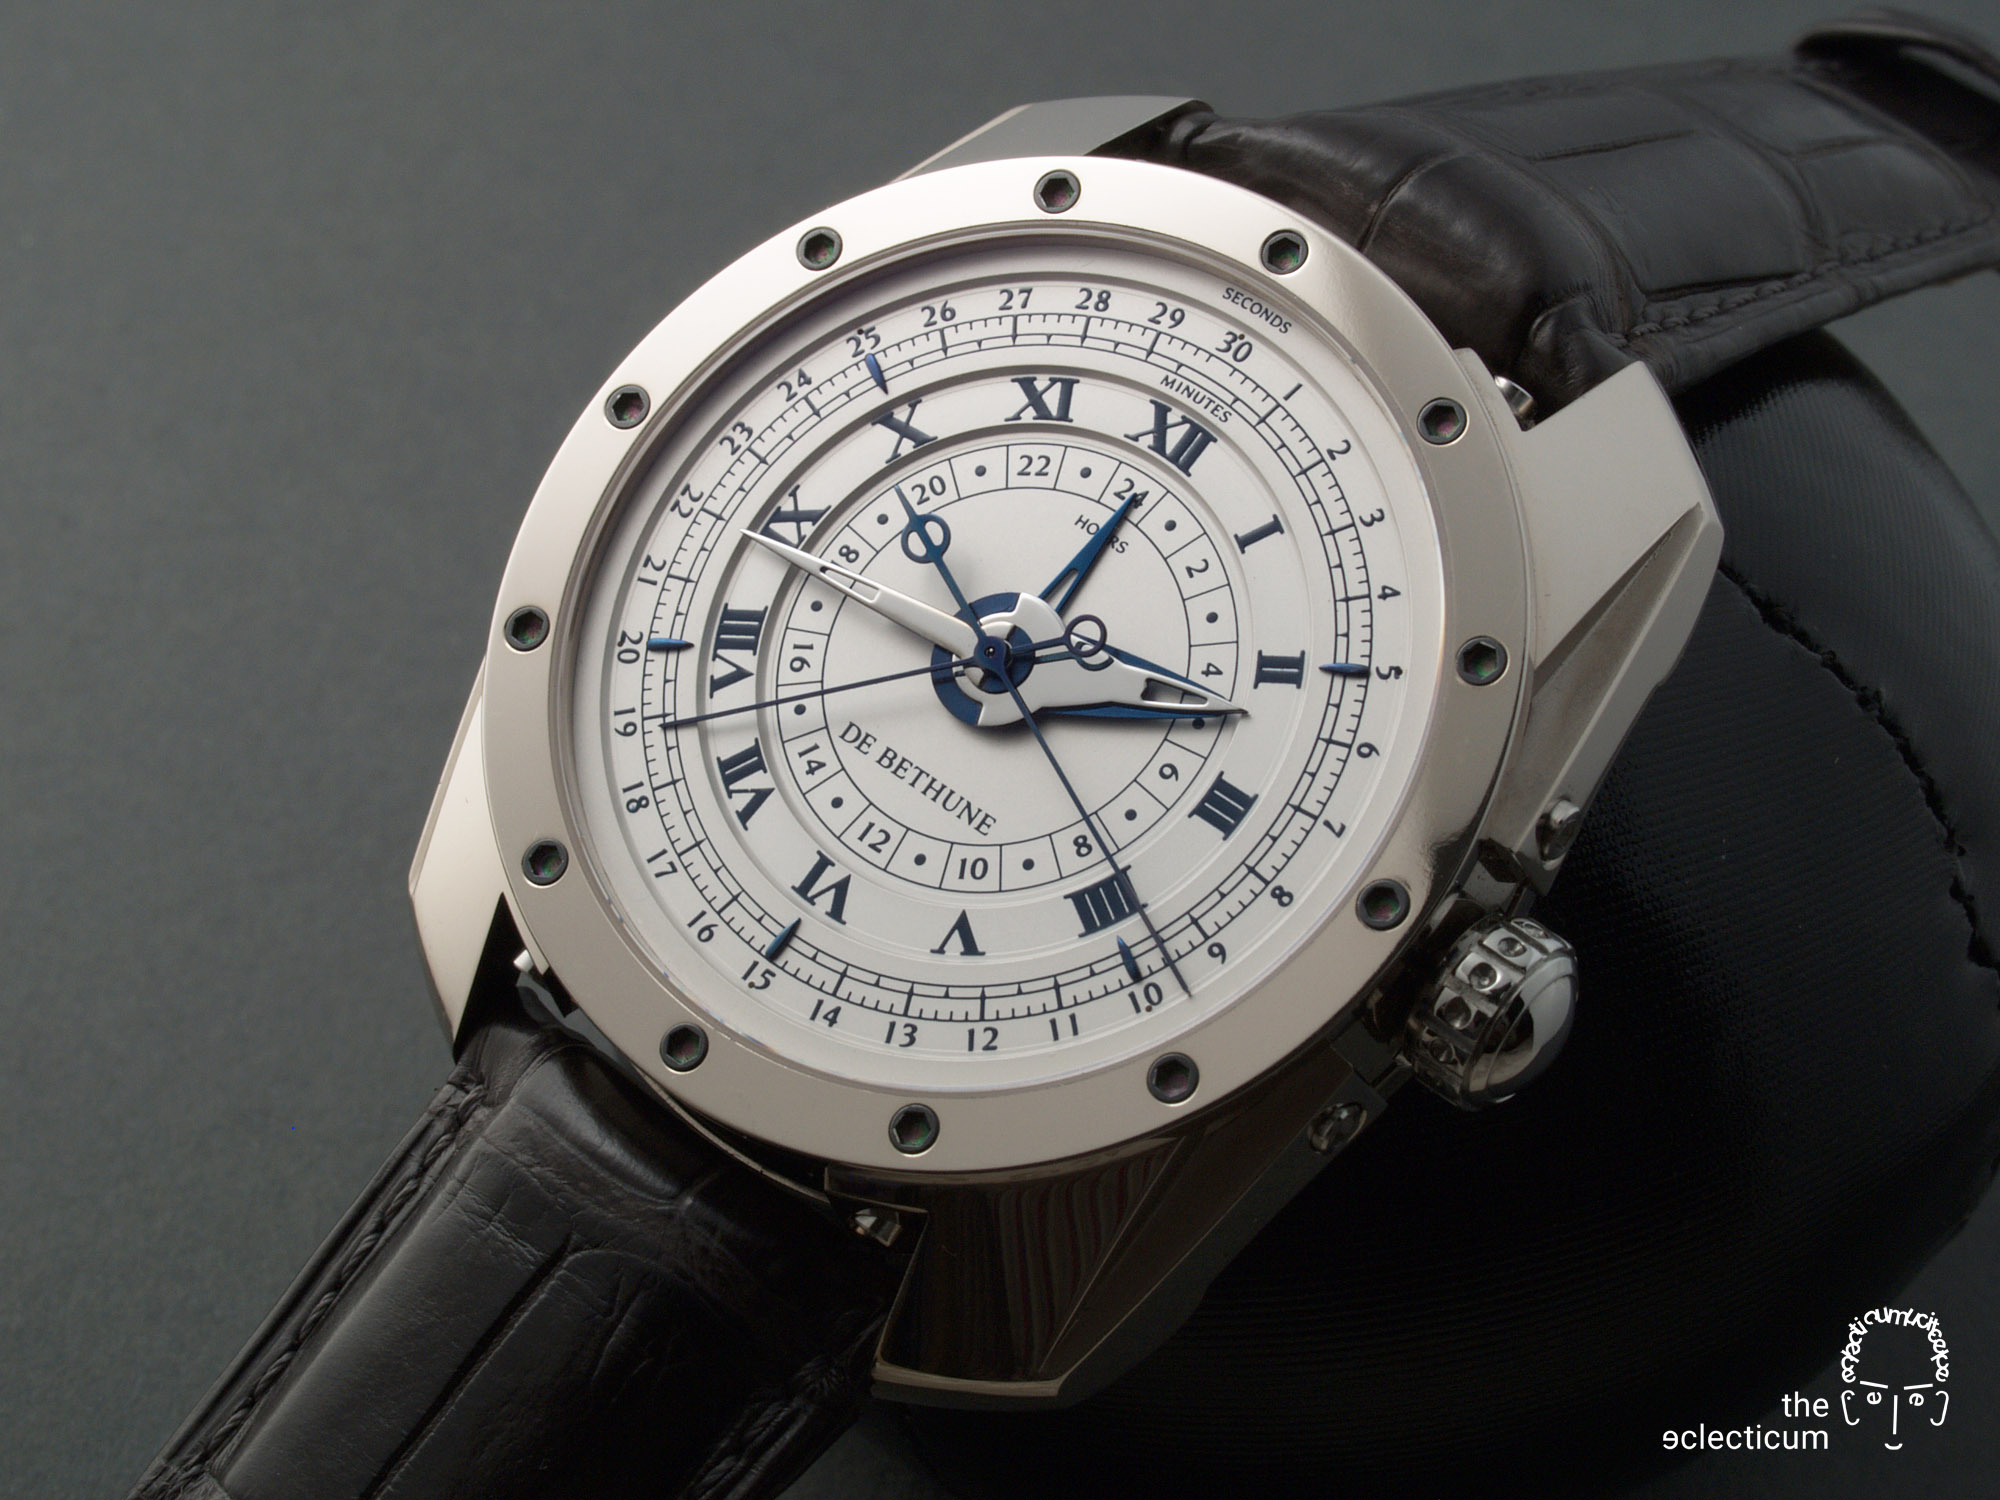 De Bethune DB21 MaxiChrono chronograph central stack manufacture